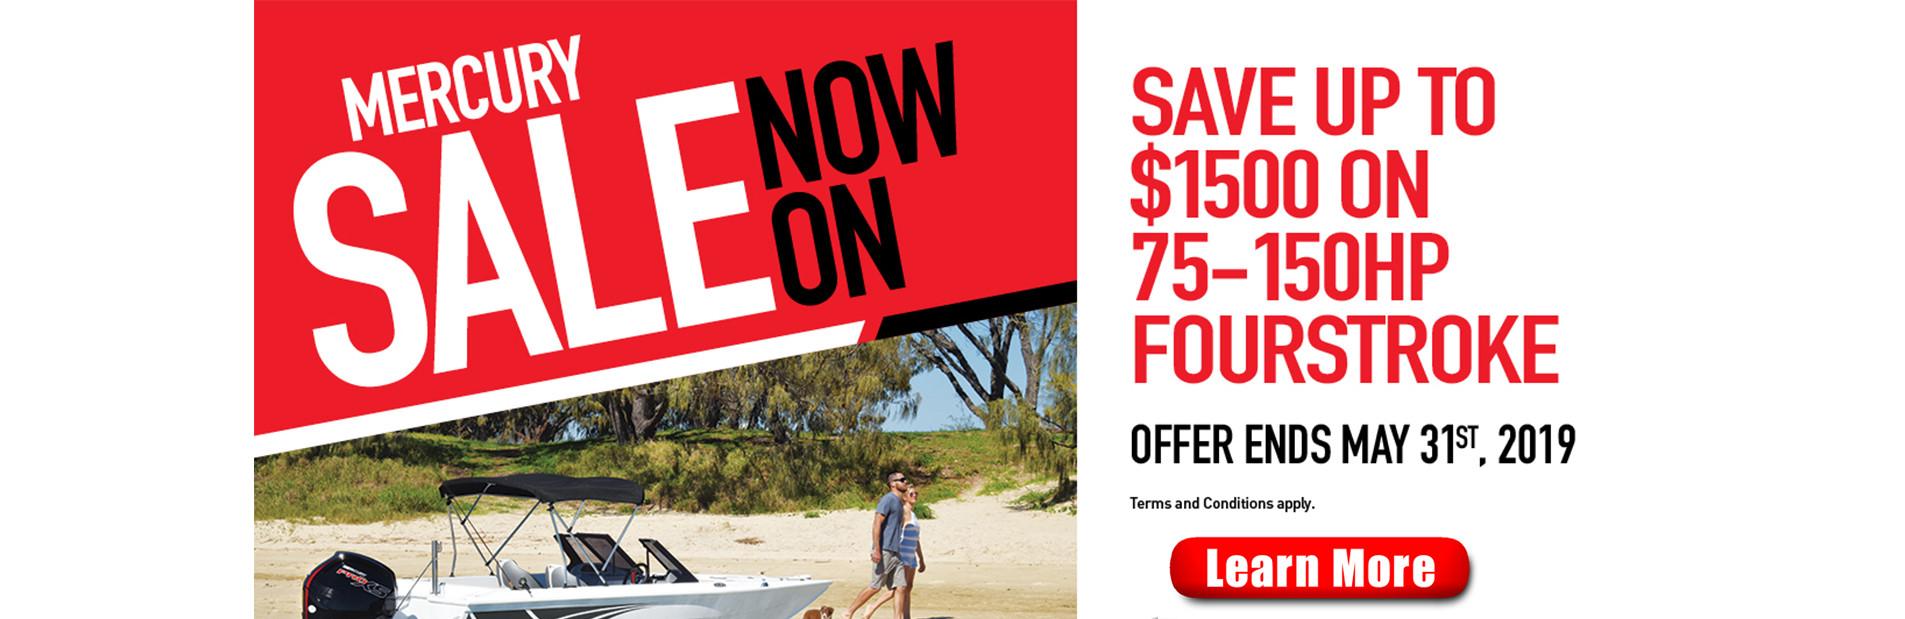 Mercury 75 to 150hp Fourstroke Sale Now On!